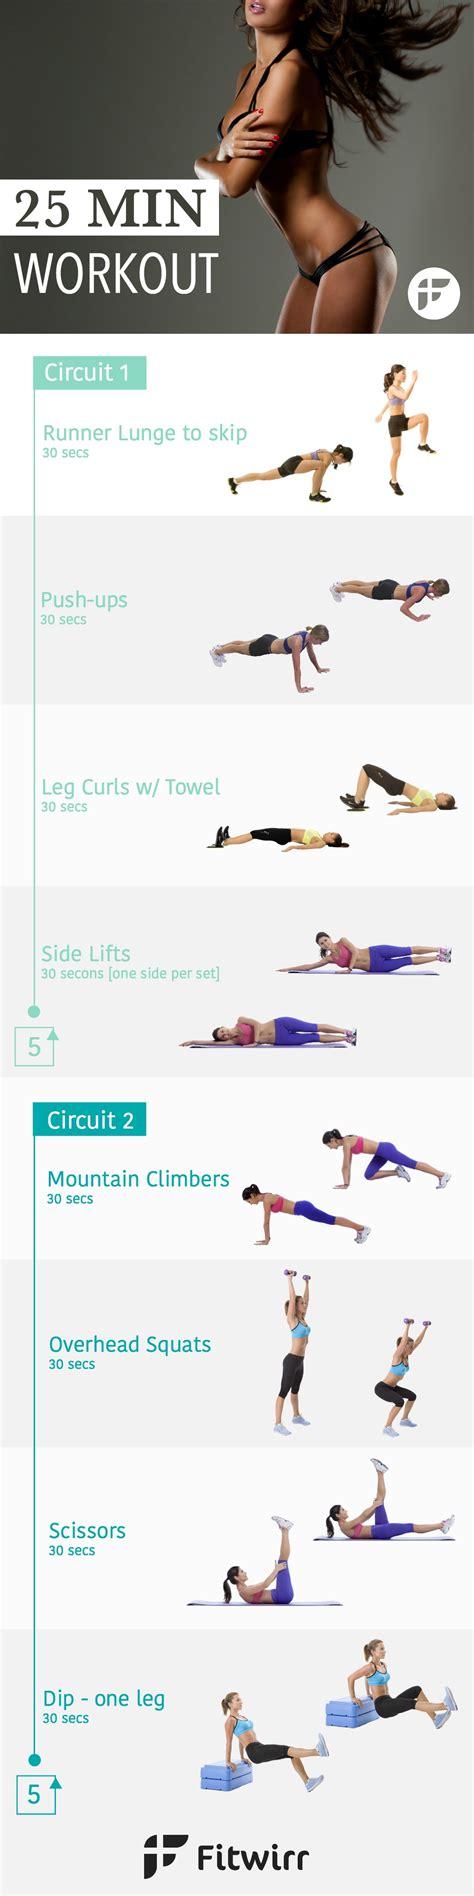 circuit training circuit training workouts 25 minute workout circuit training for women